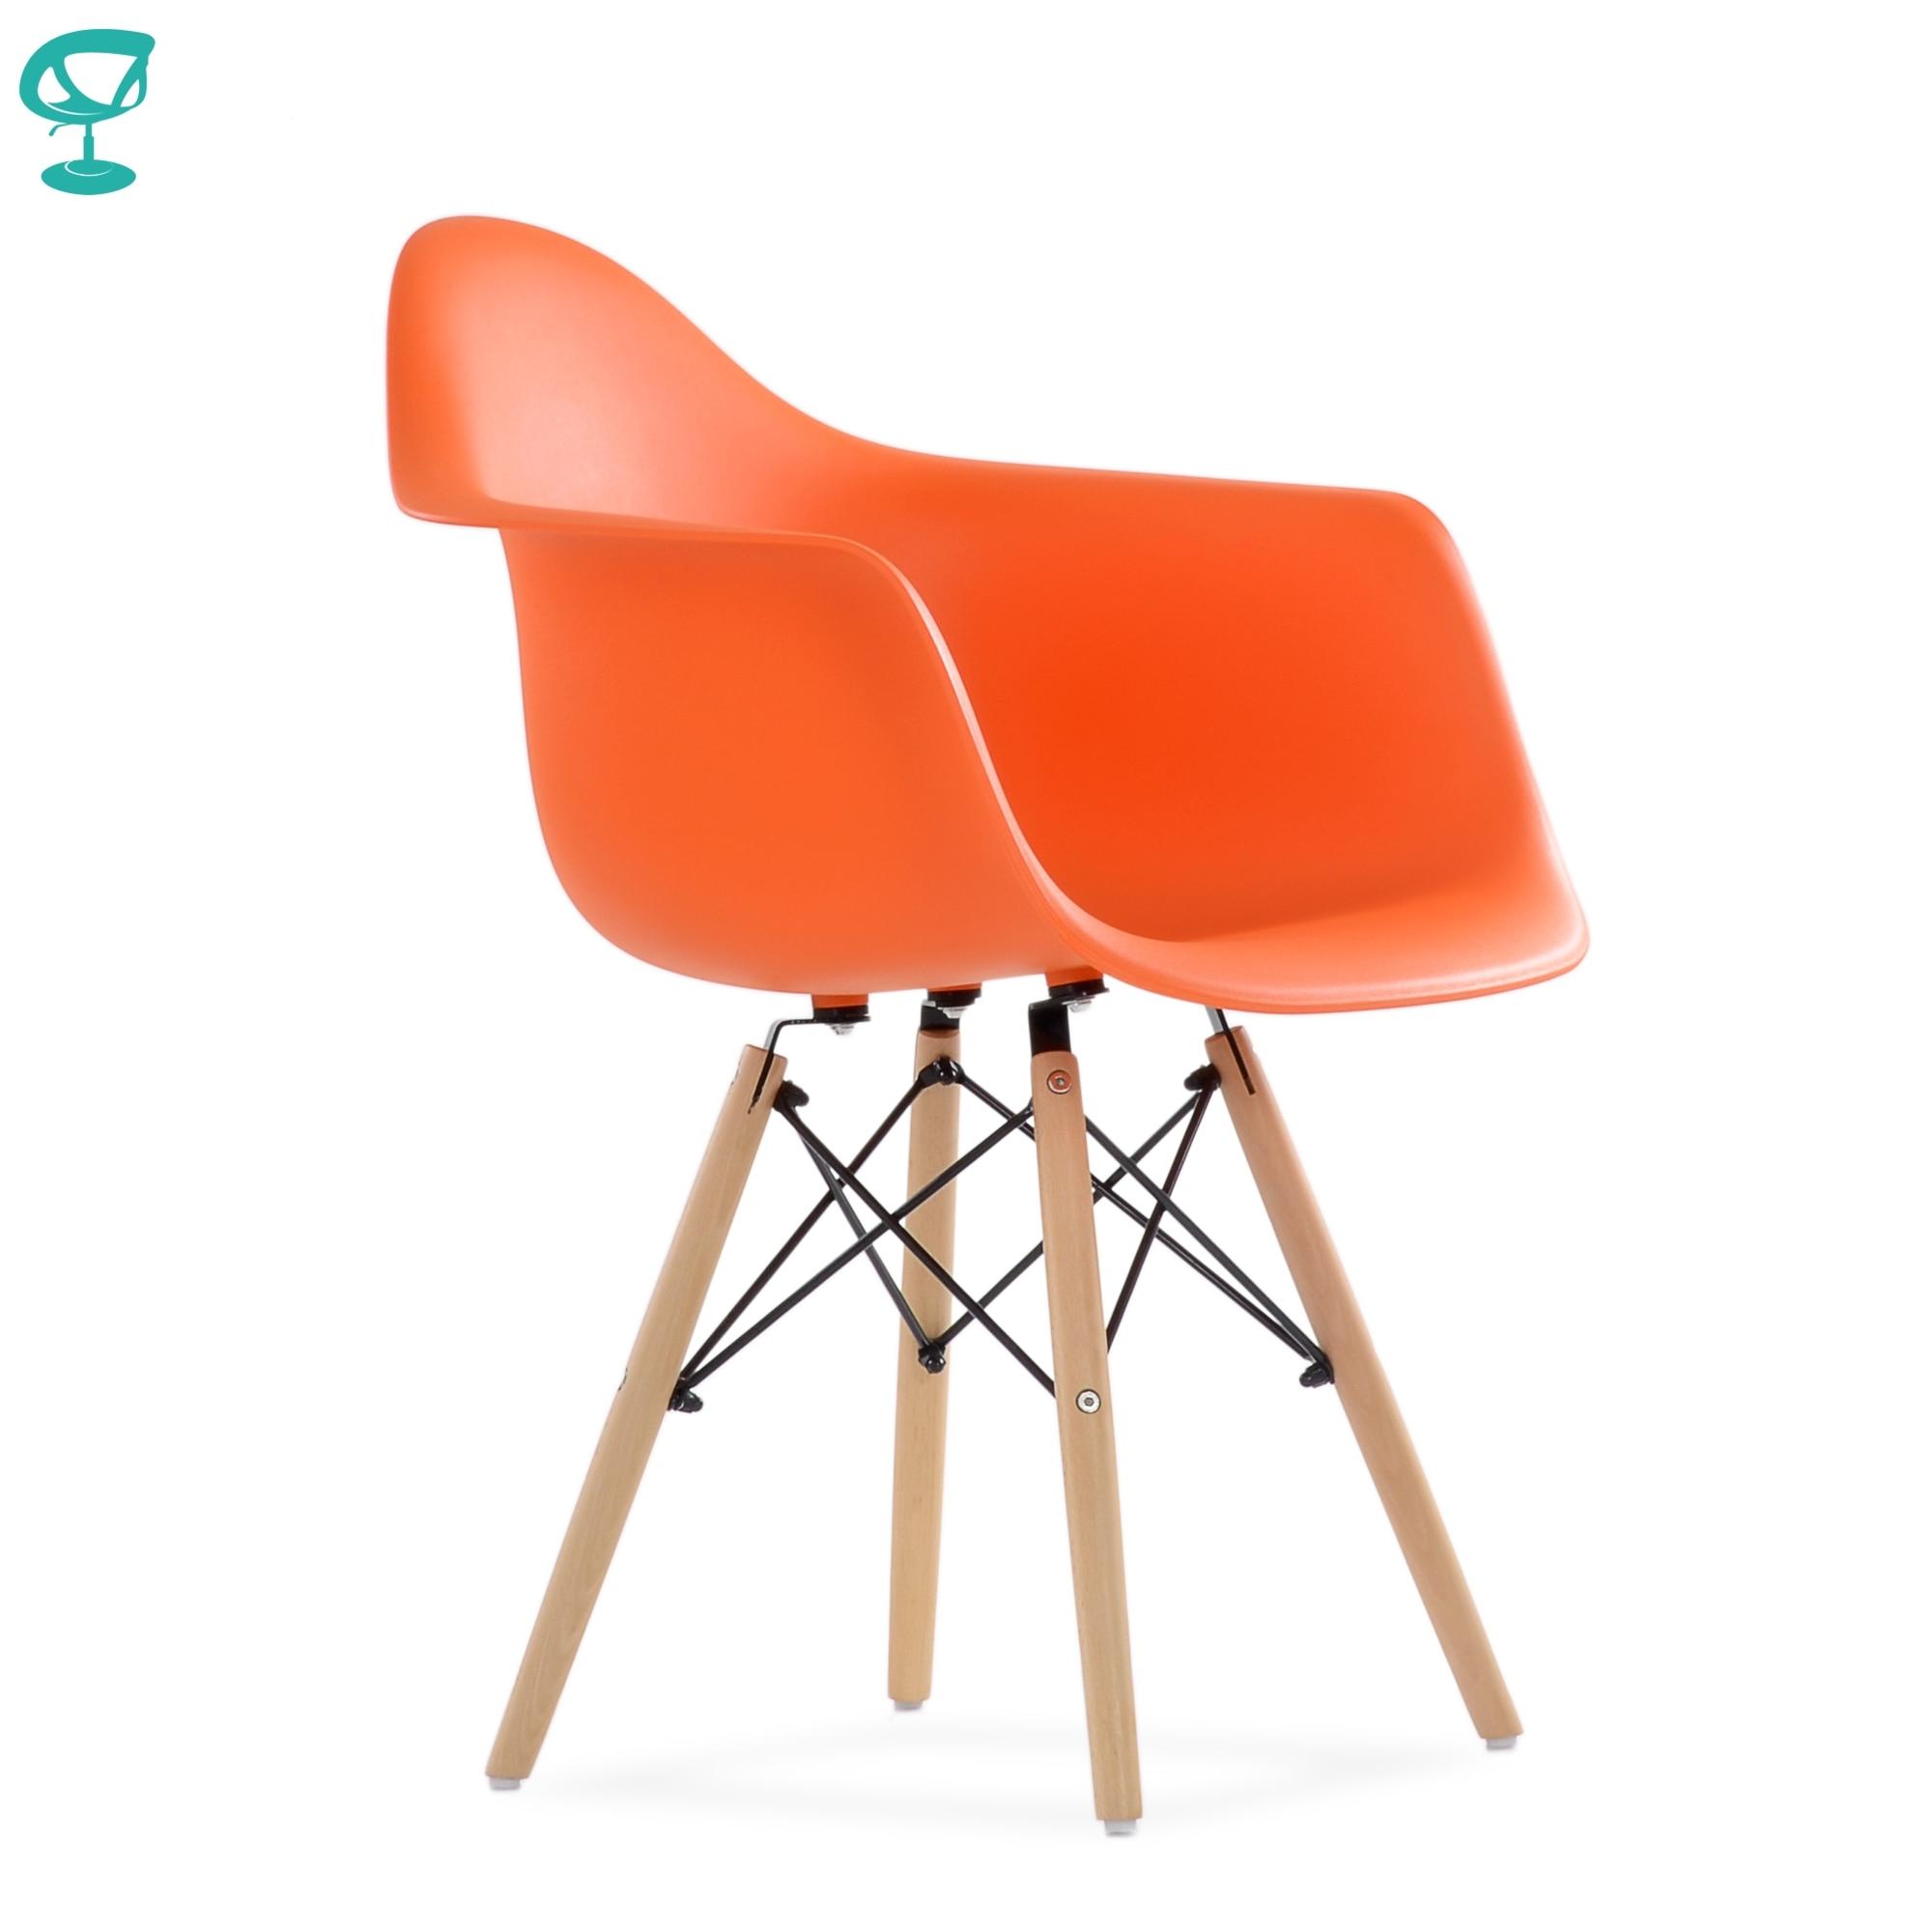 95752 Barneo N-14 Plastic Kitchen Breakfast Interior Stool Bar Chair Kitchen Furniture Orange Free Shipping In Russia